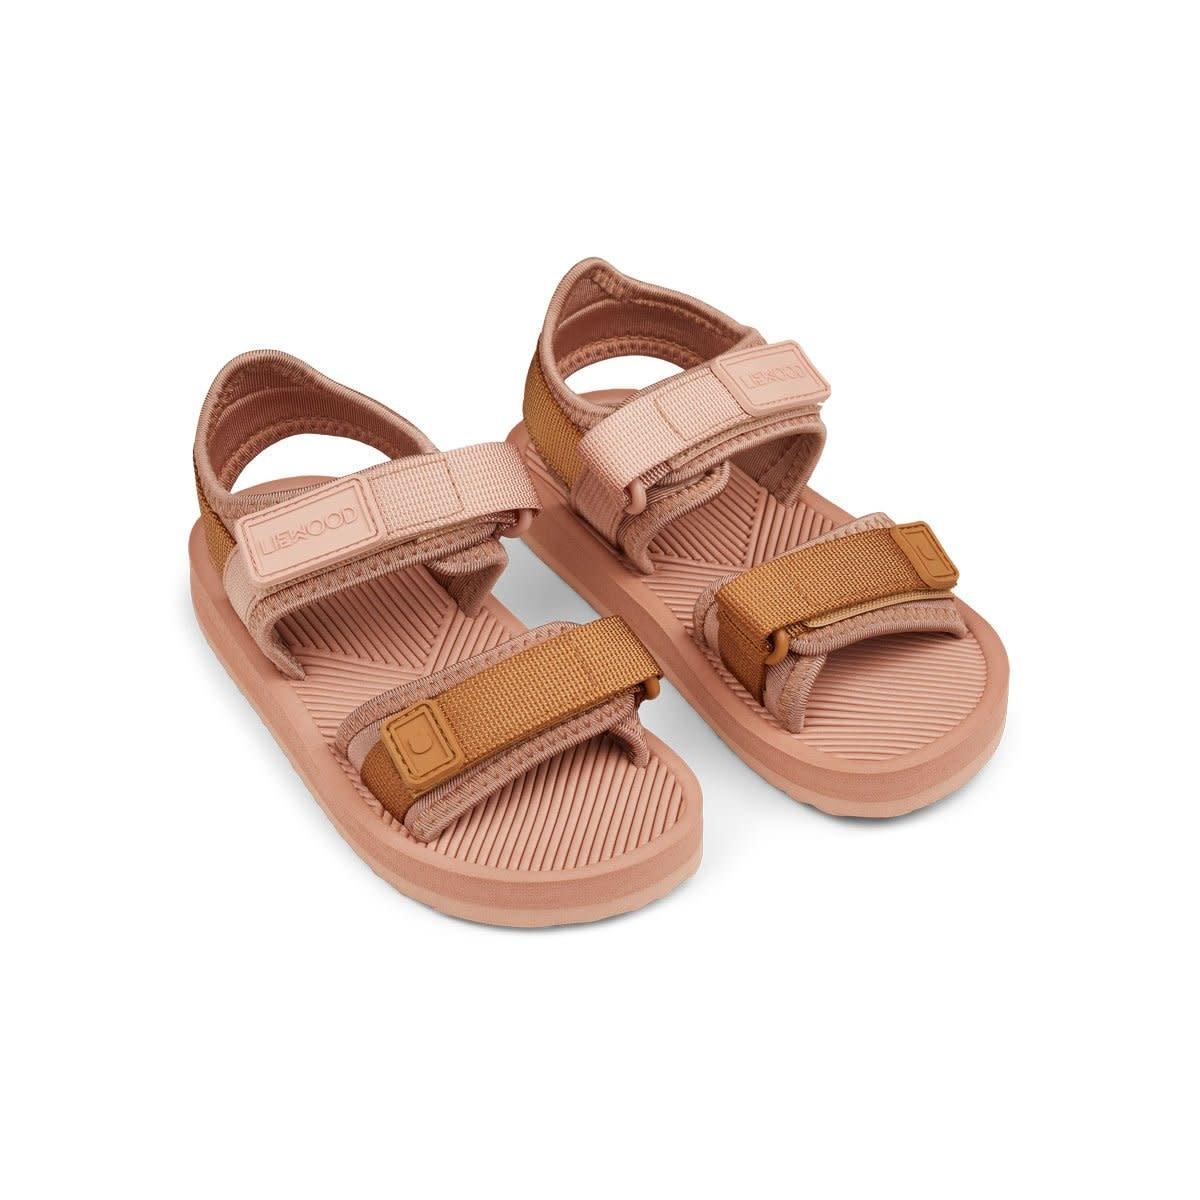 Monty sandals rose mix-2